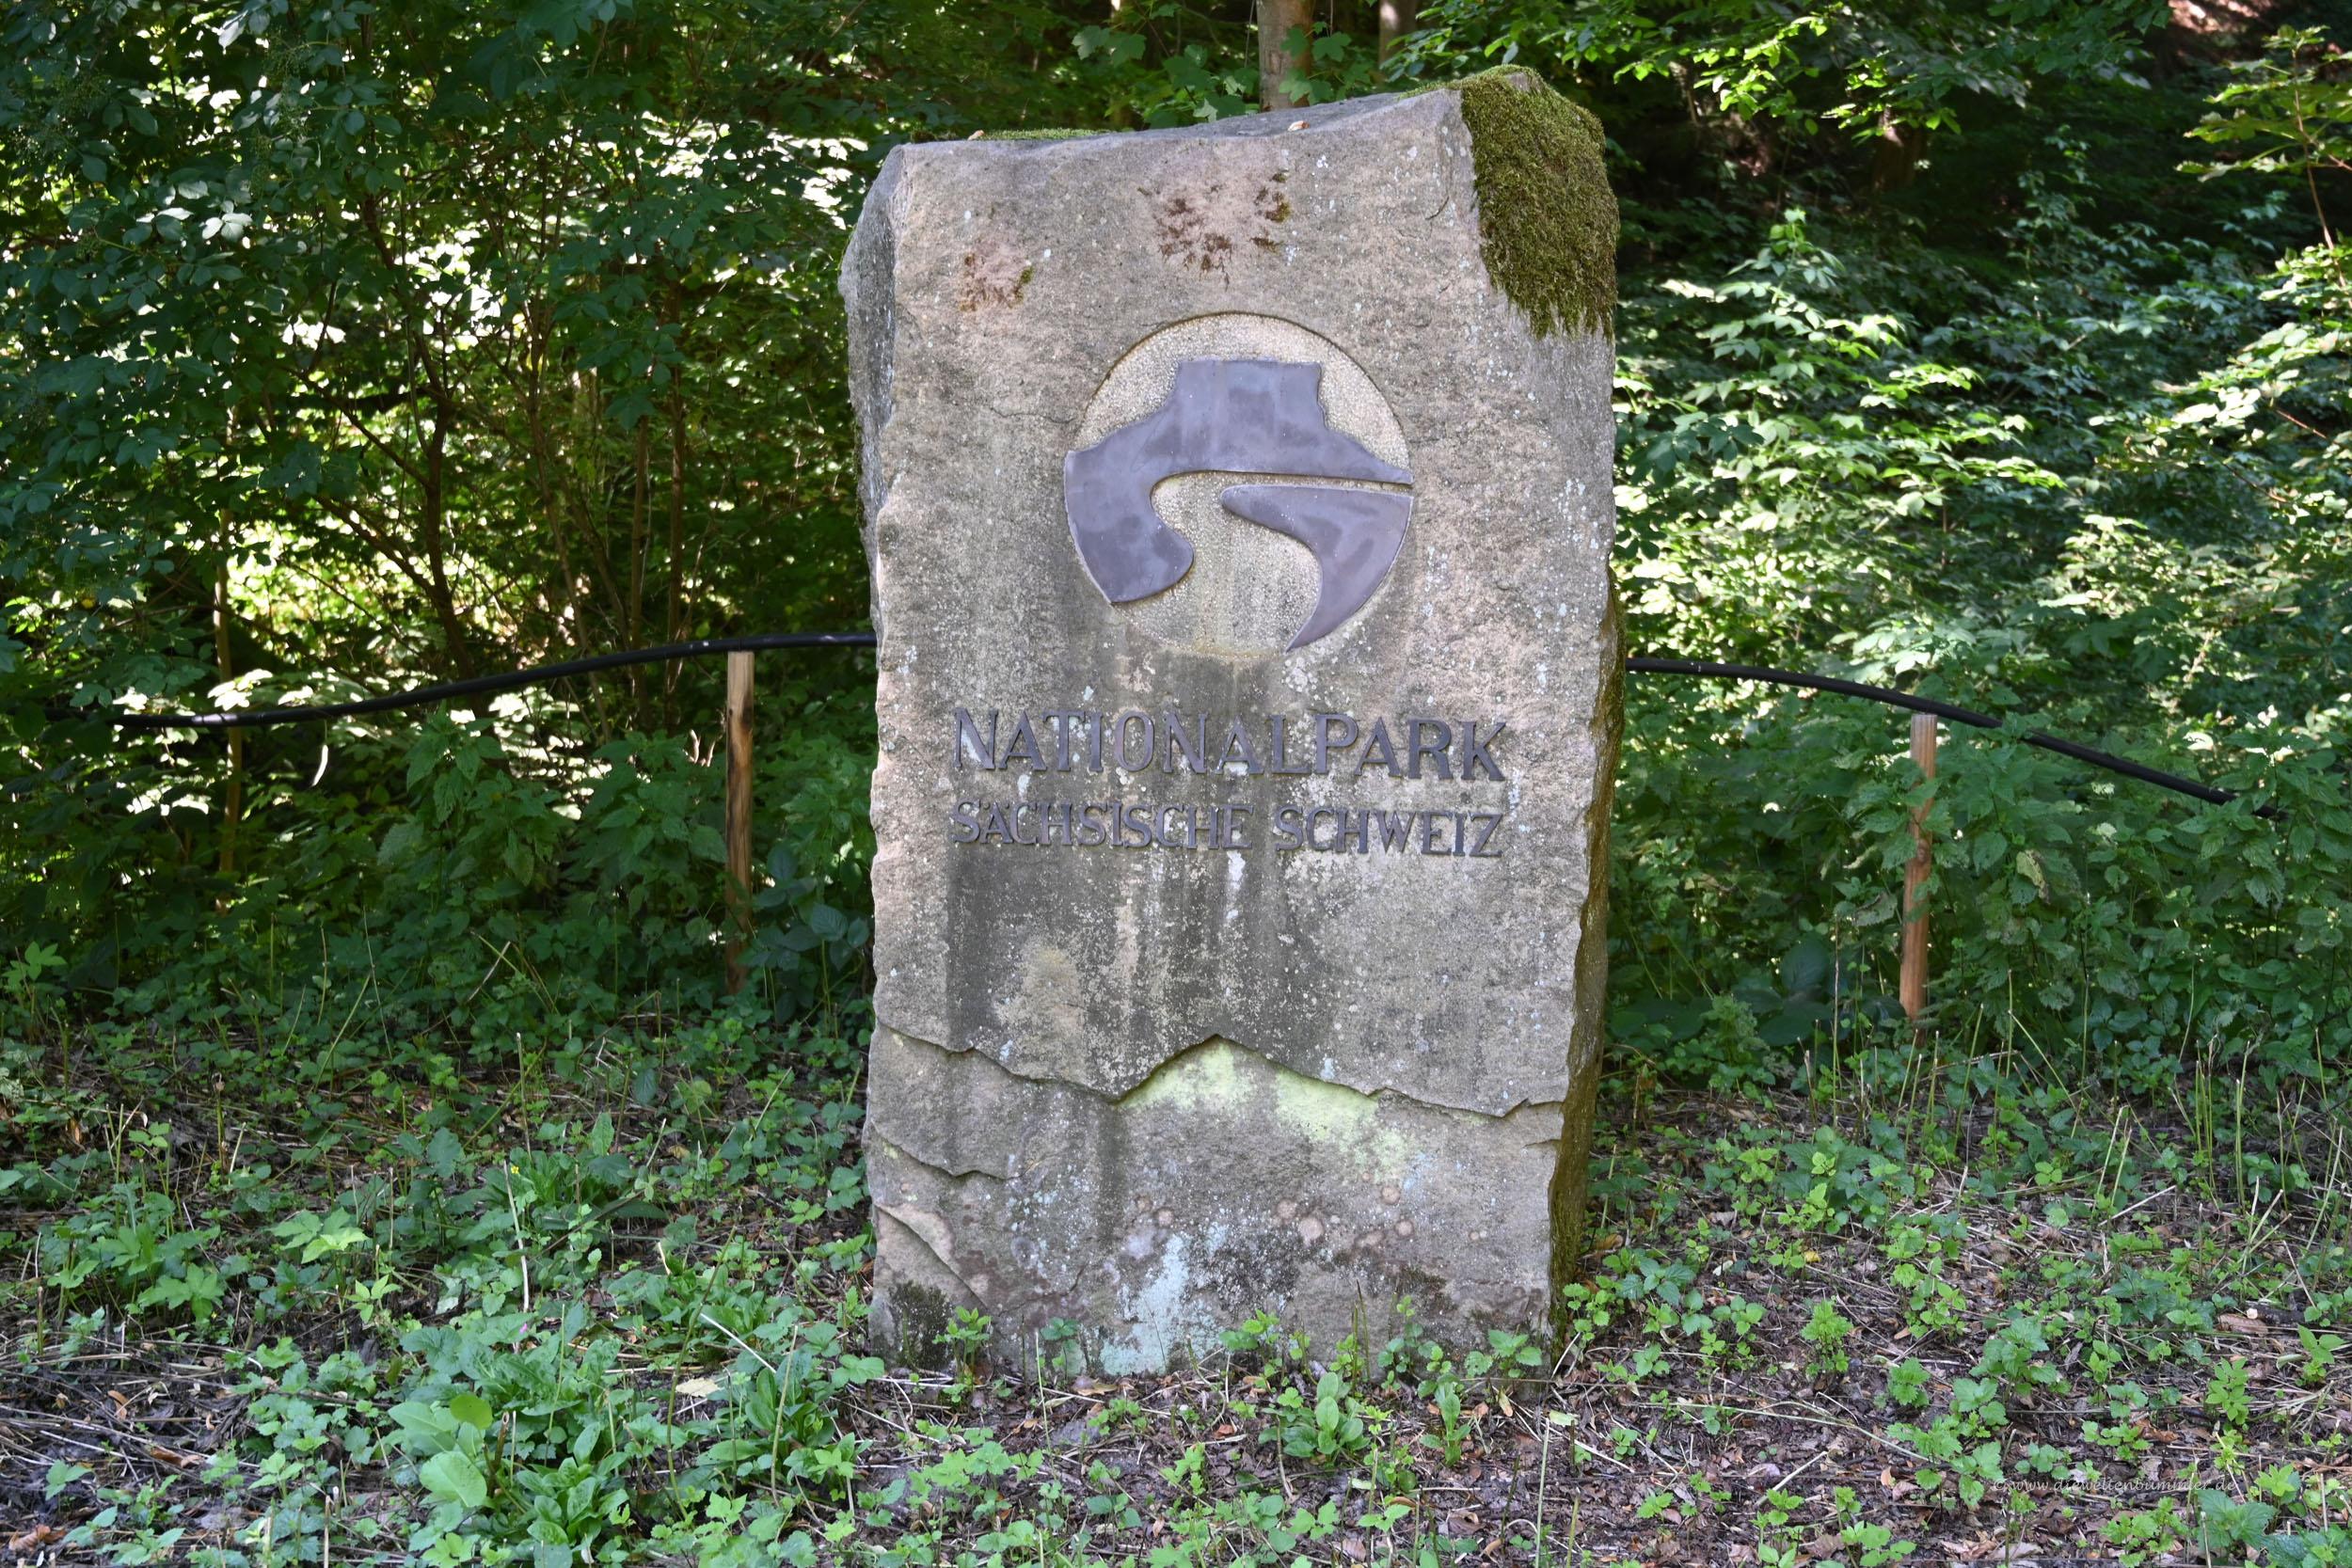 Zugang zum Nationalpark